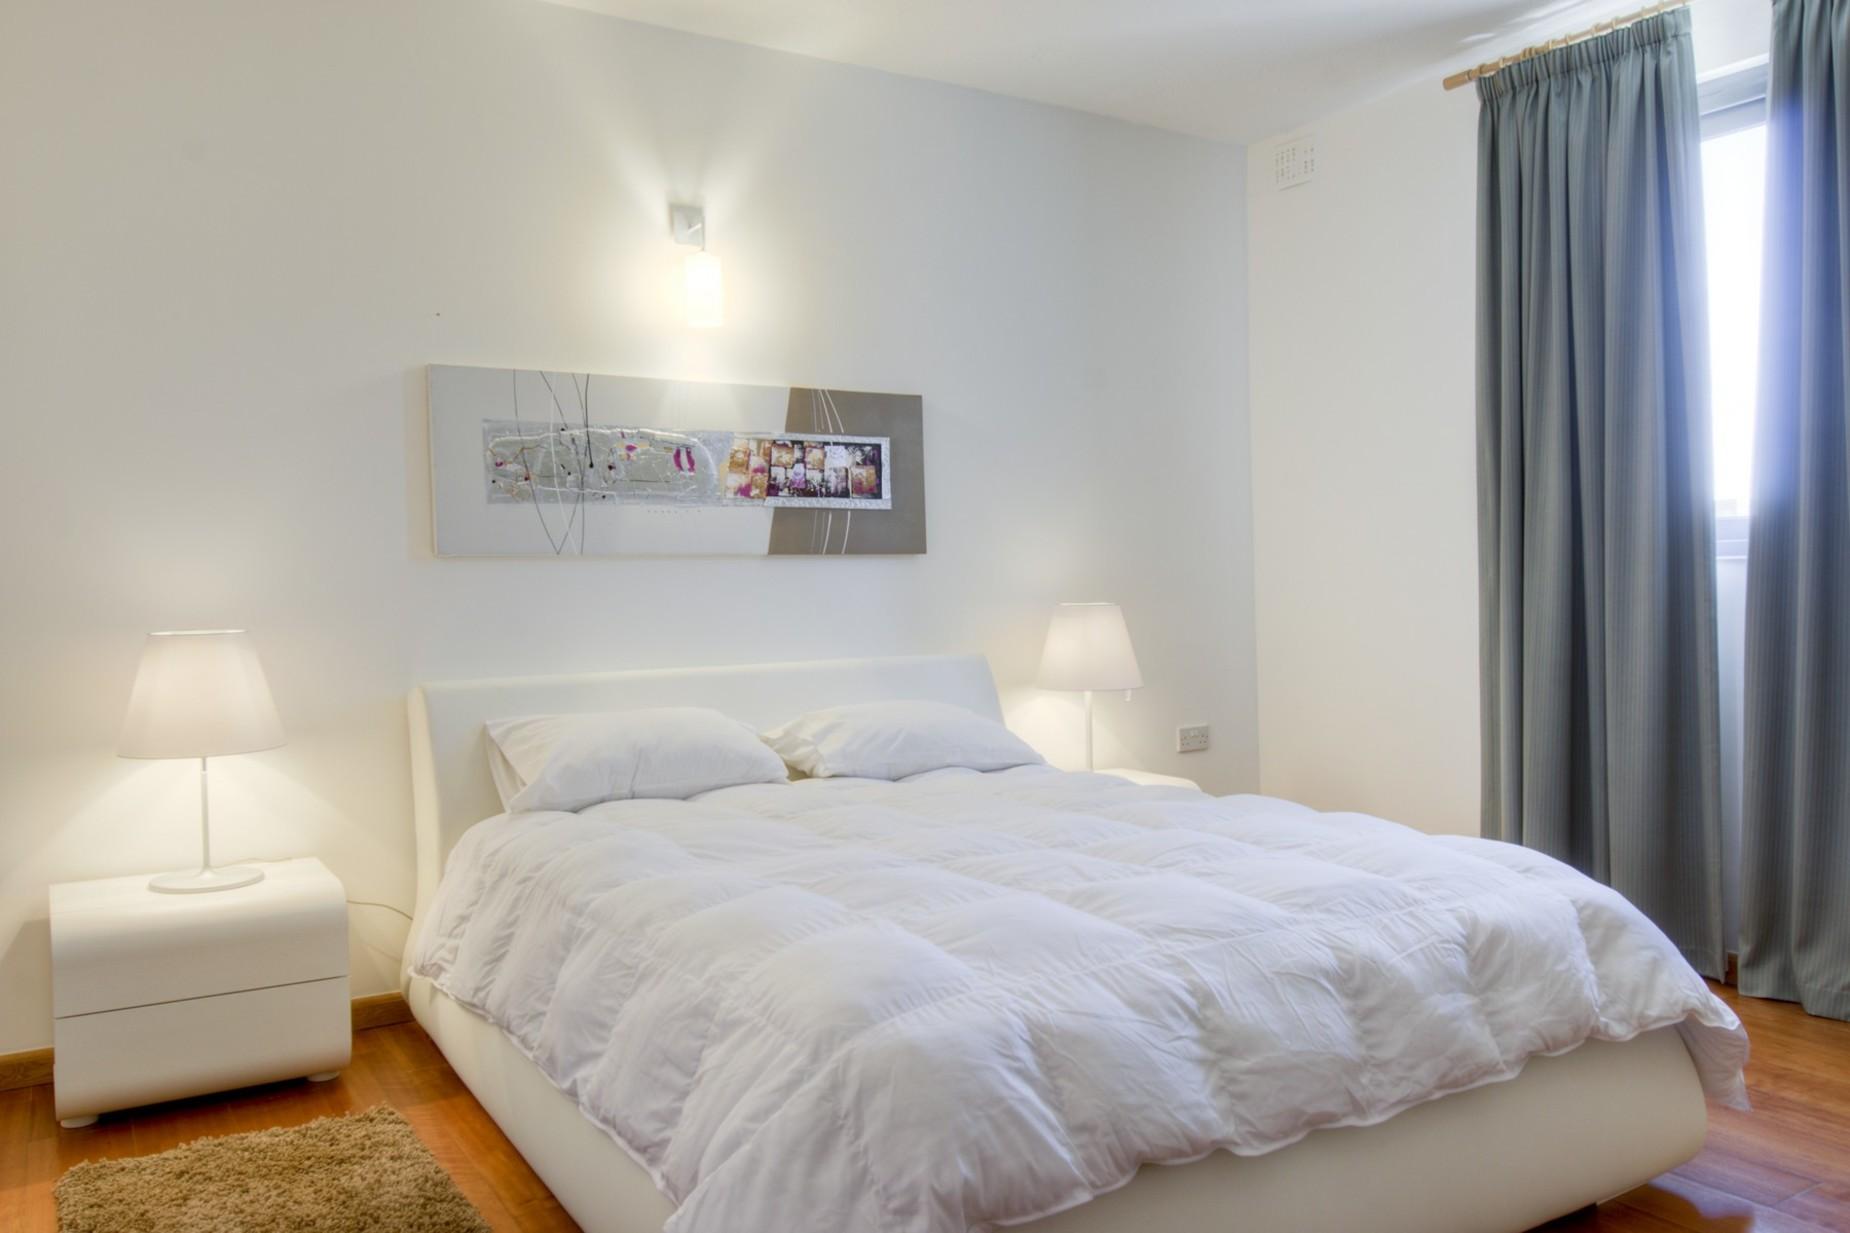 4 bed Villa For Sale in Bahar ic-Caghaq, Bahar ic-Caghaq - thumb 4